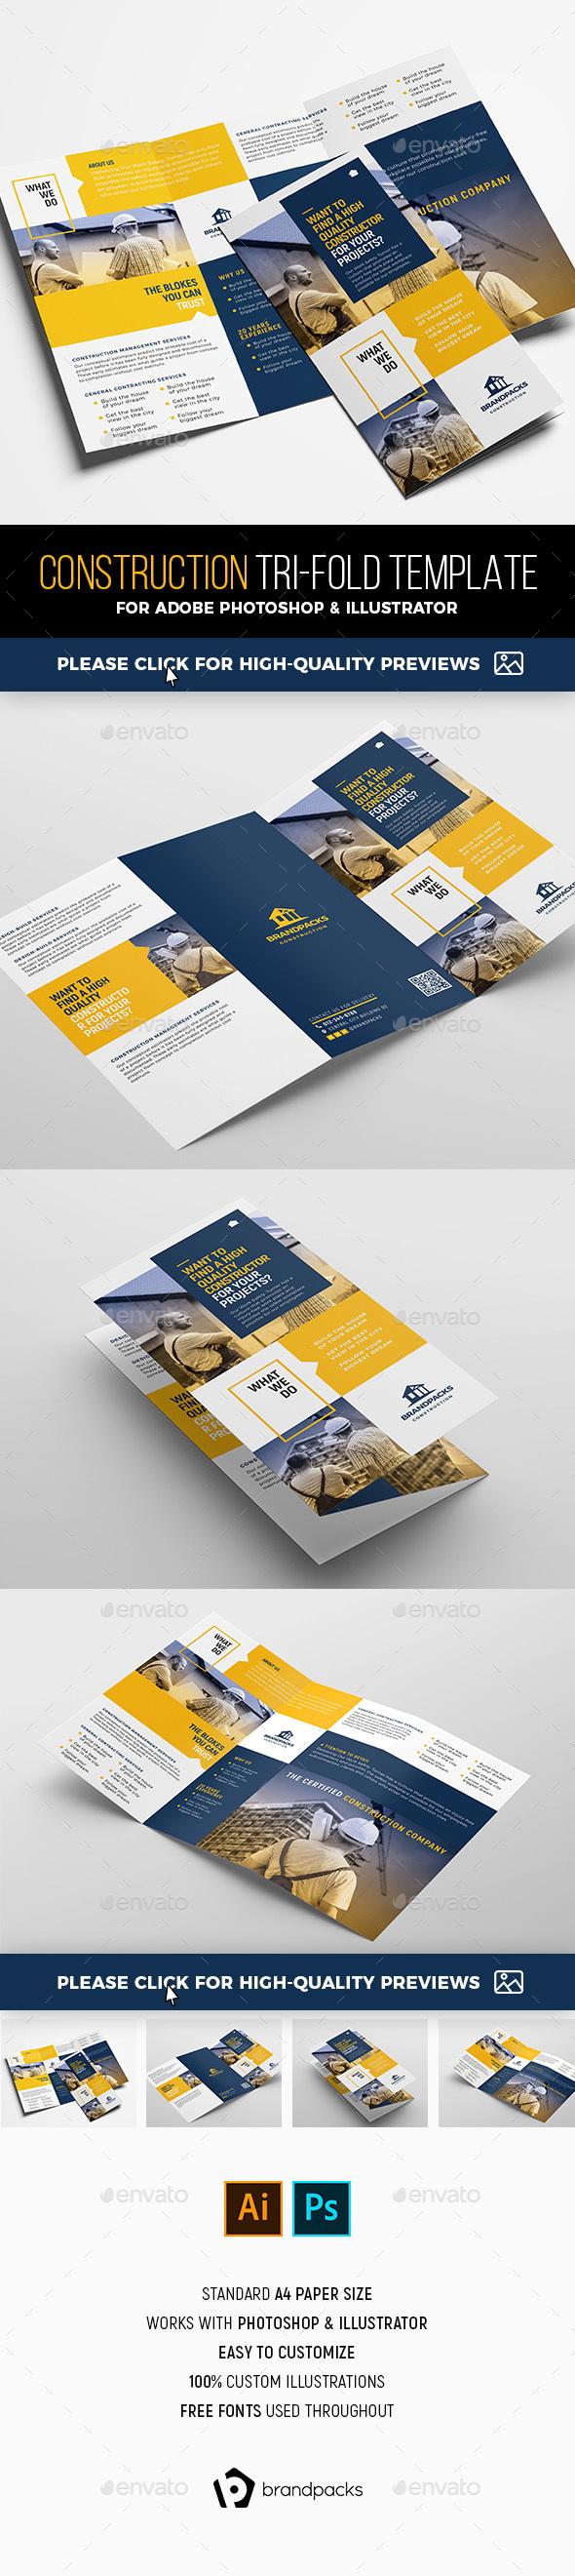 Construction Tri-Fold Brochure Template - Corporate Brochures